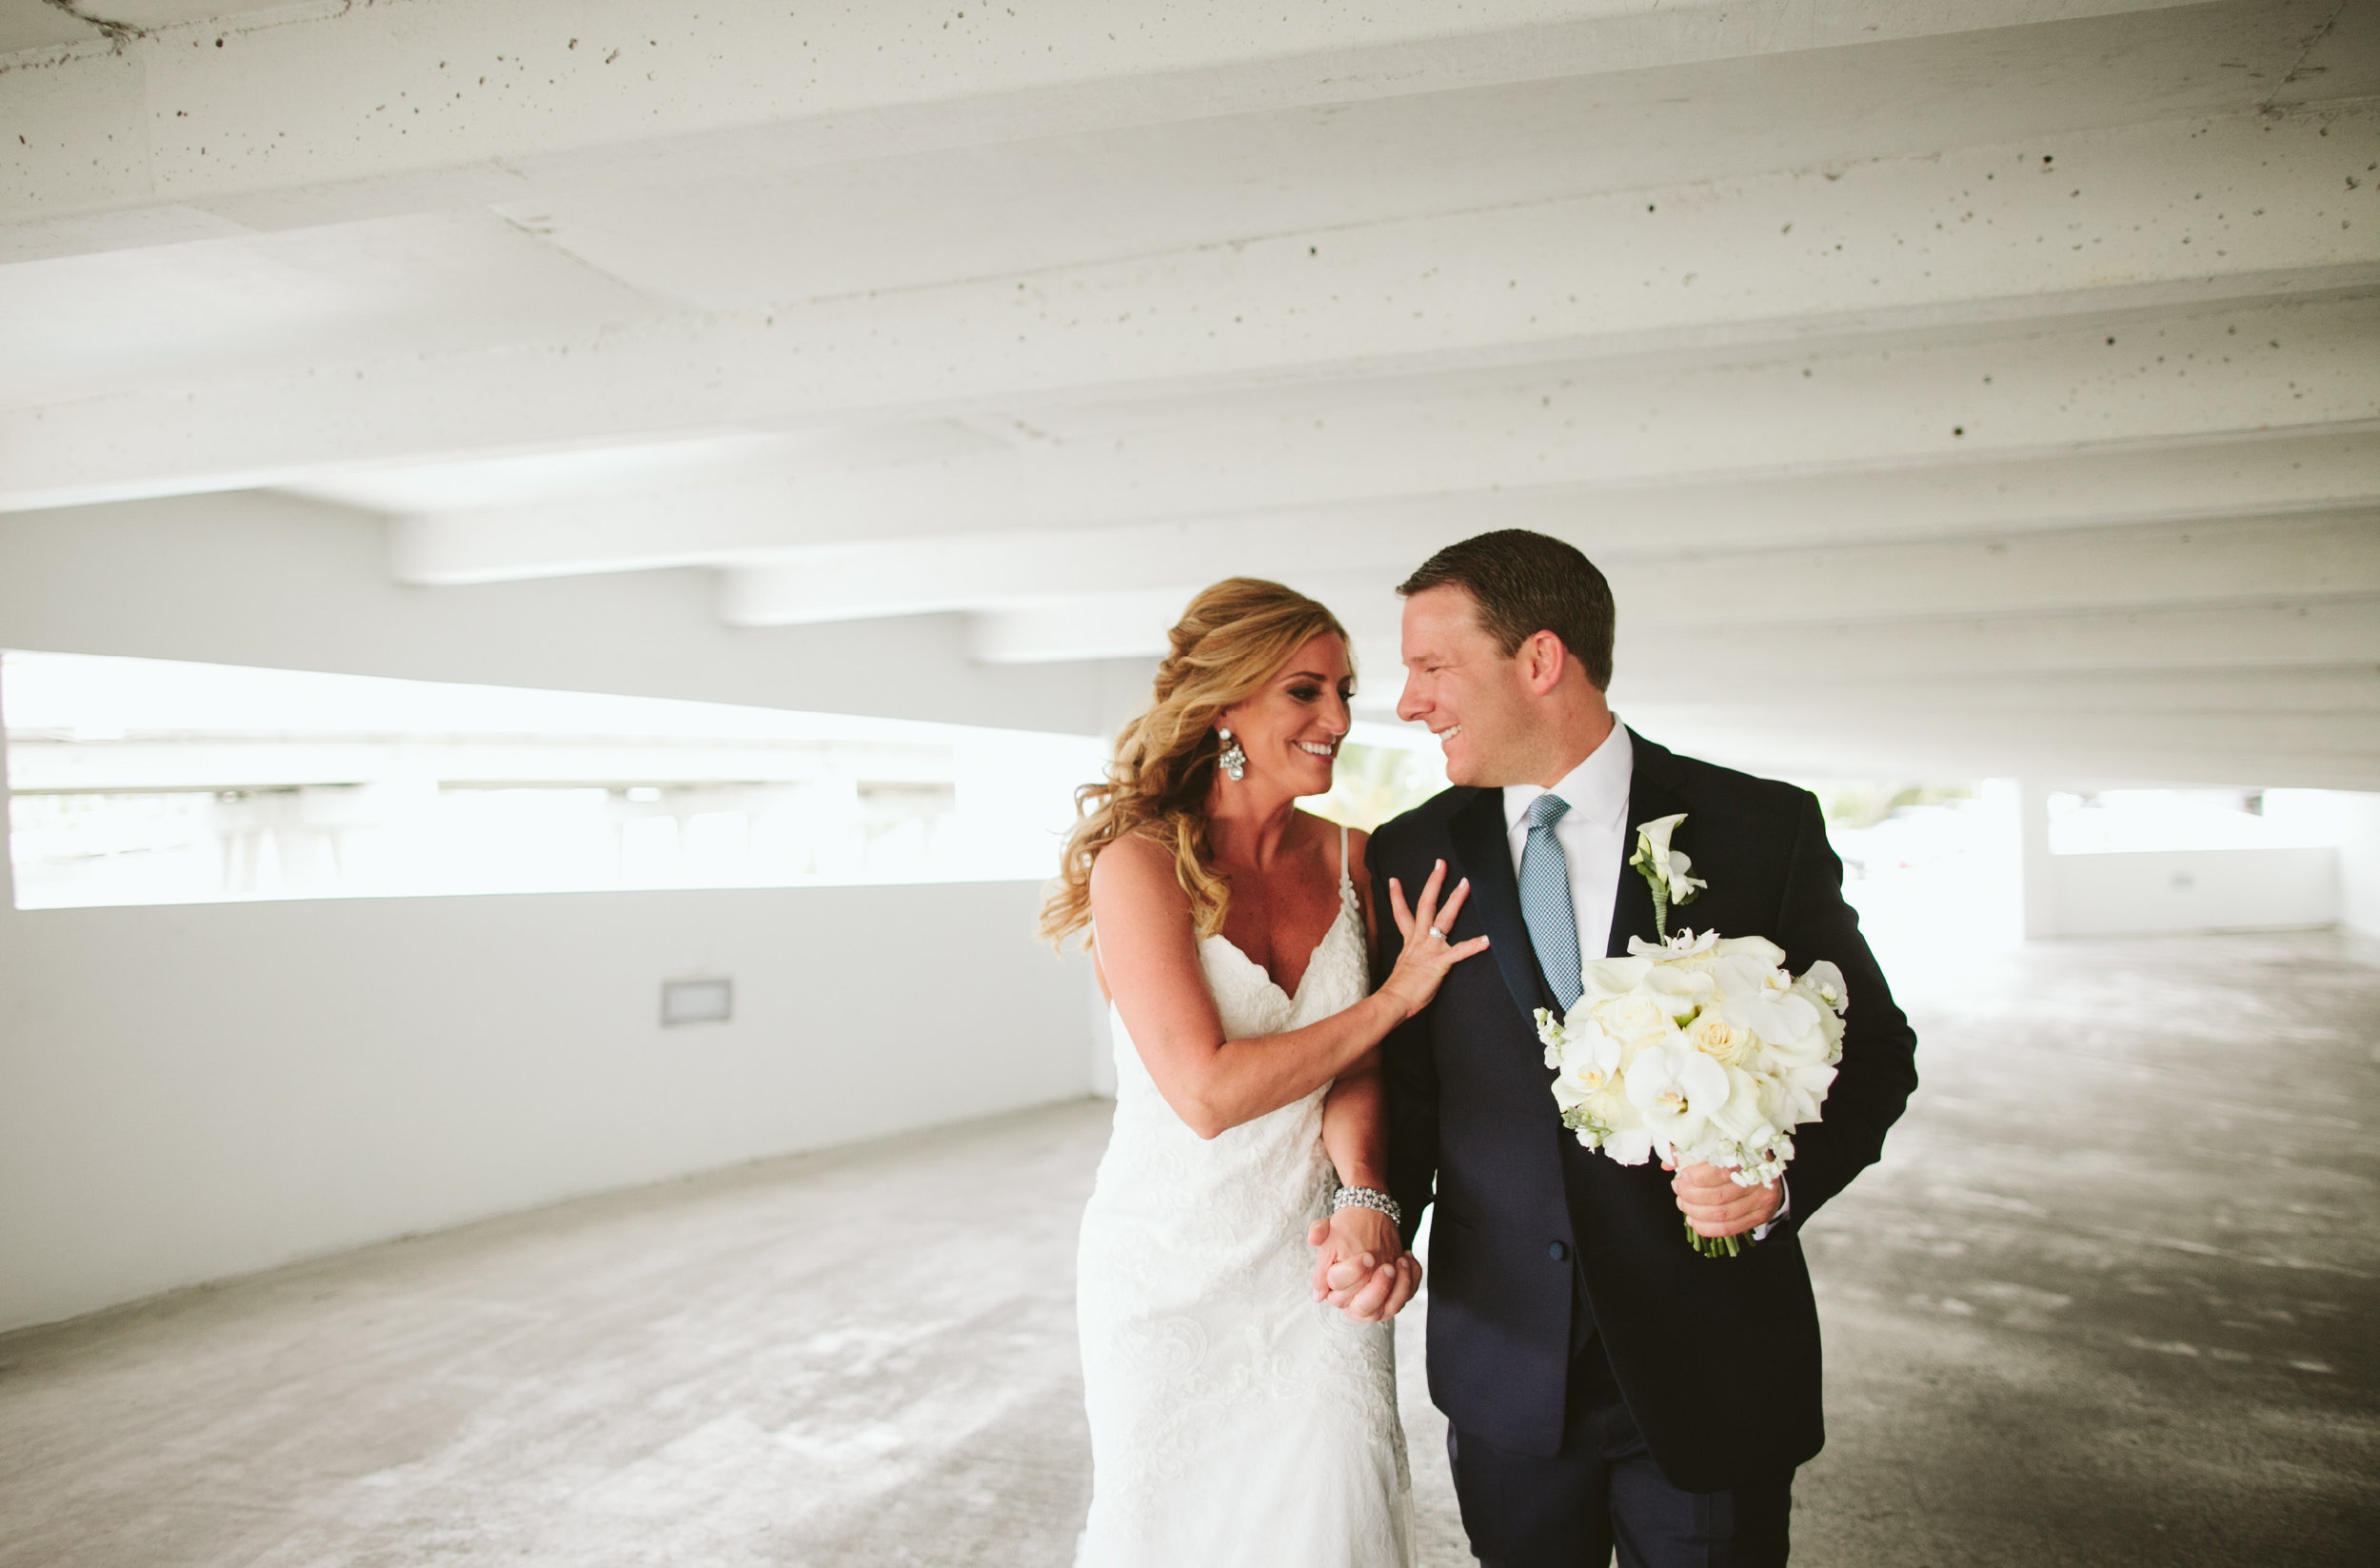 Kim + John's Wedding at the Waterstone Hotel in Boca Raton33.jpg